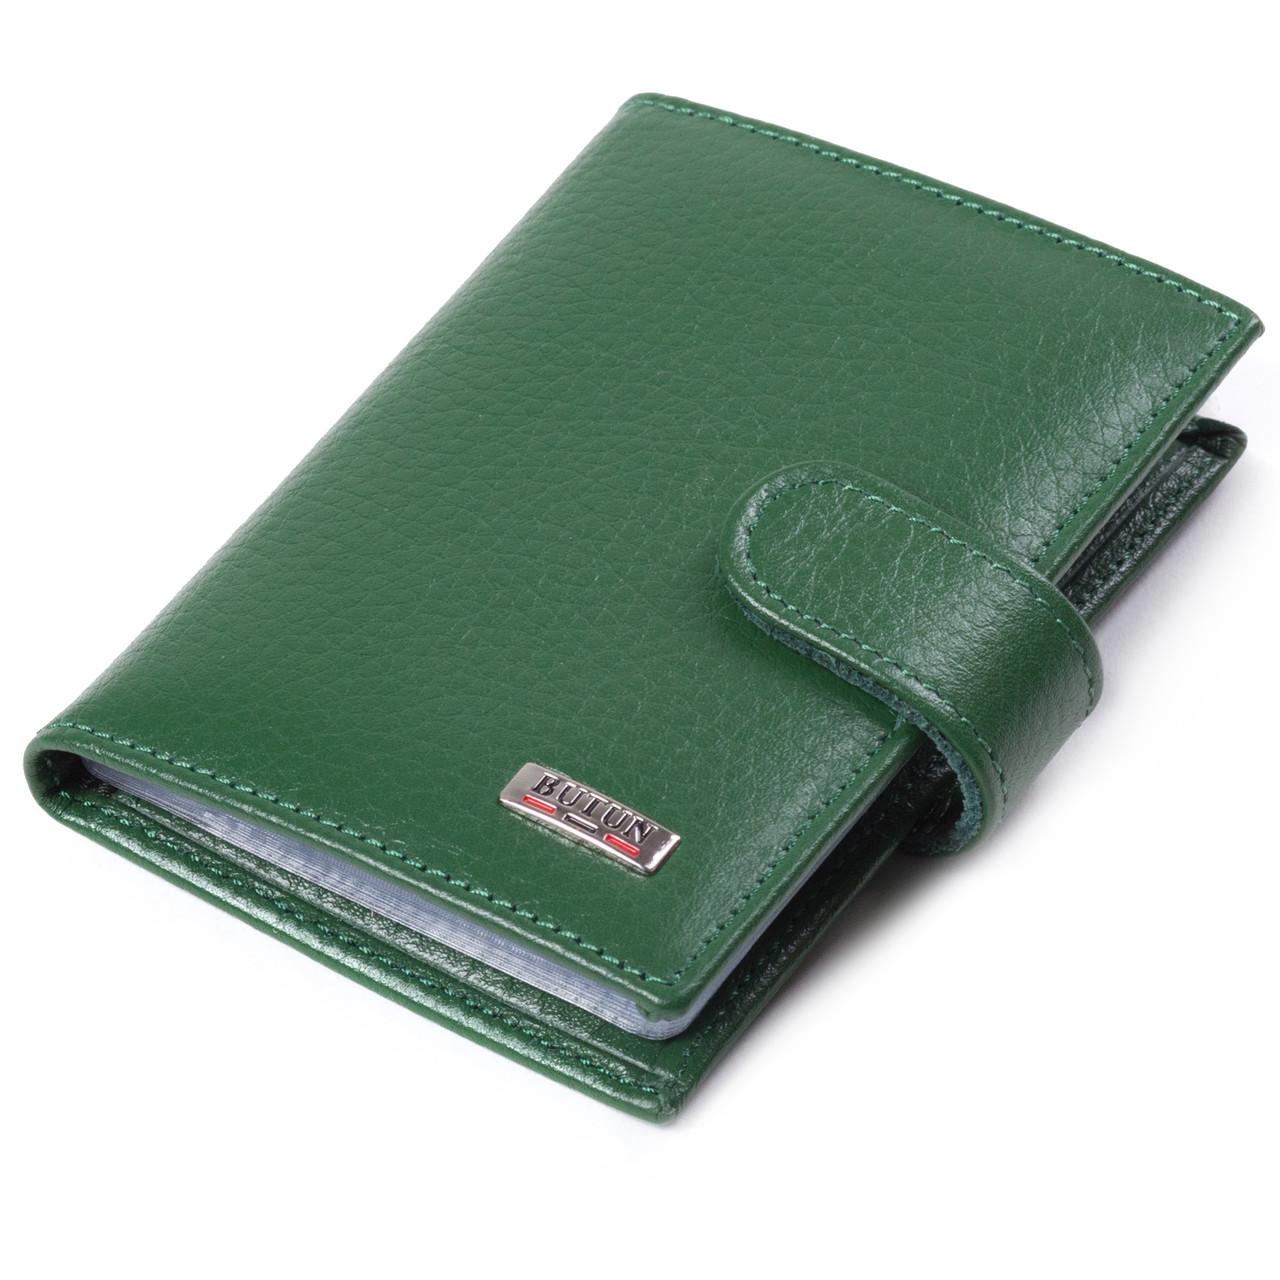 Визитница кредитница кожаная зеленая Butun 152-004-075